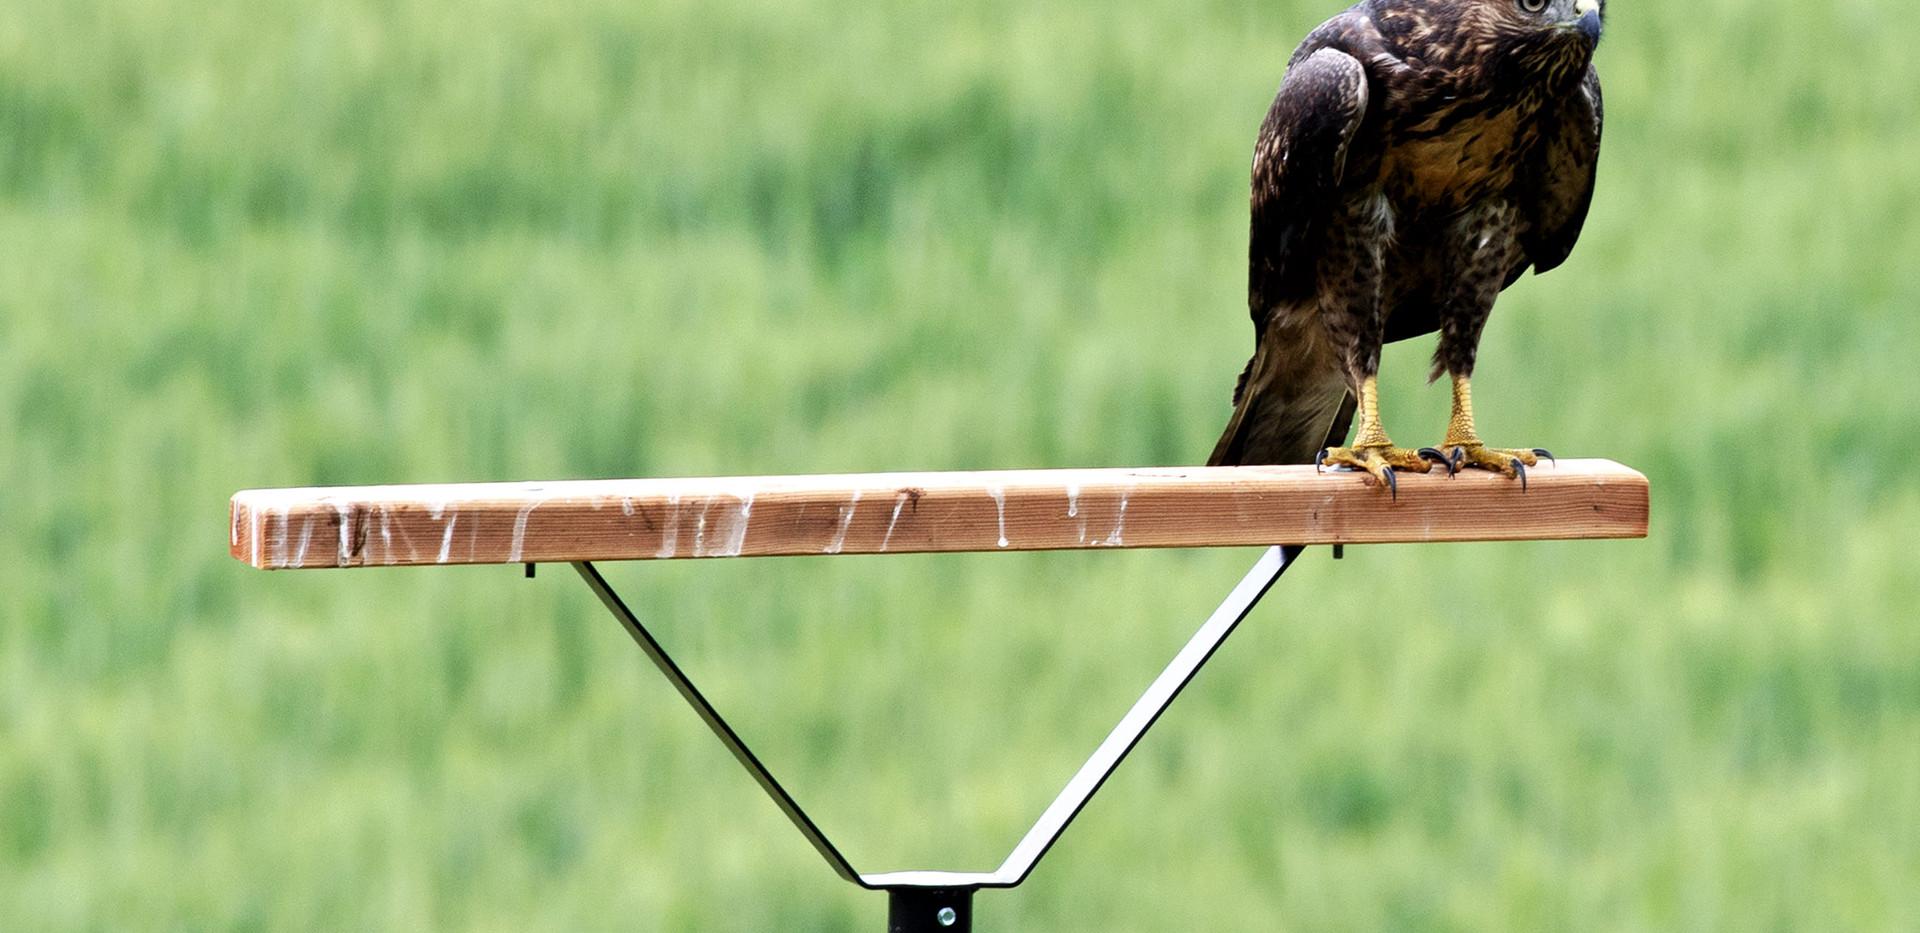 Hawk on perch 2J.jpg